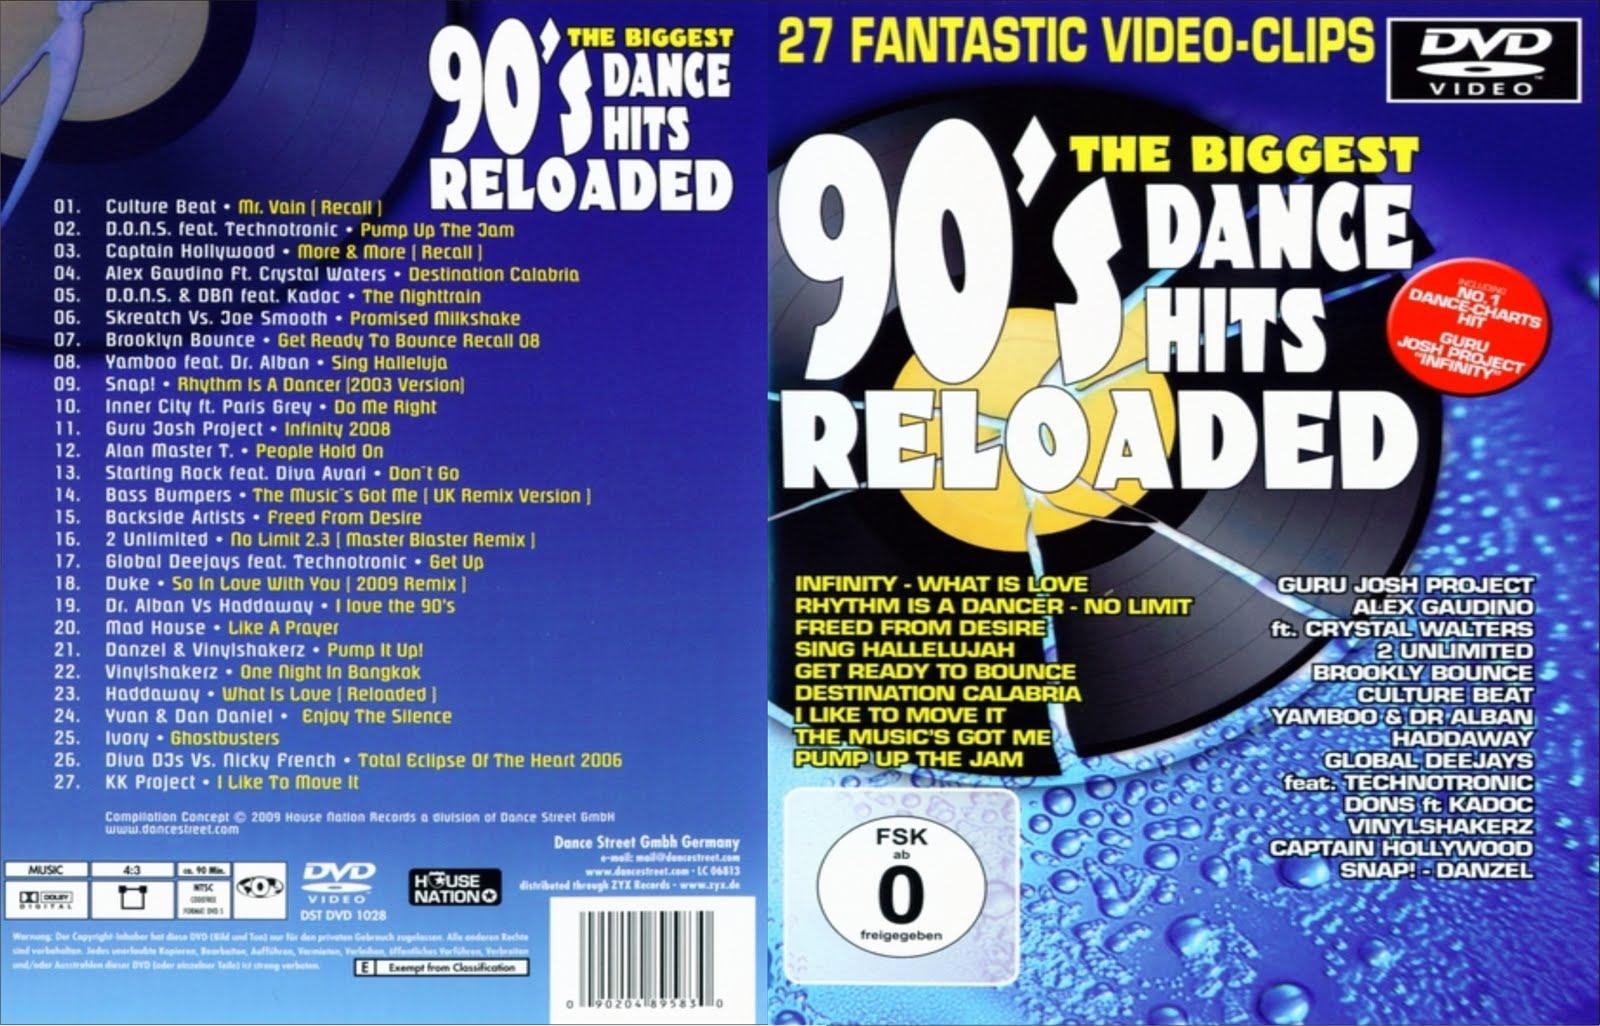 Reggaeton Party 2014 Vol 2 21 Songs: Riodvdmusic: 90's Dance Hits Reloaded